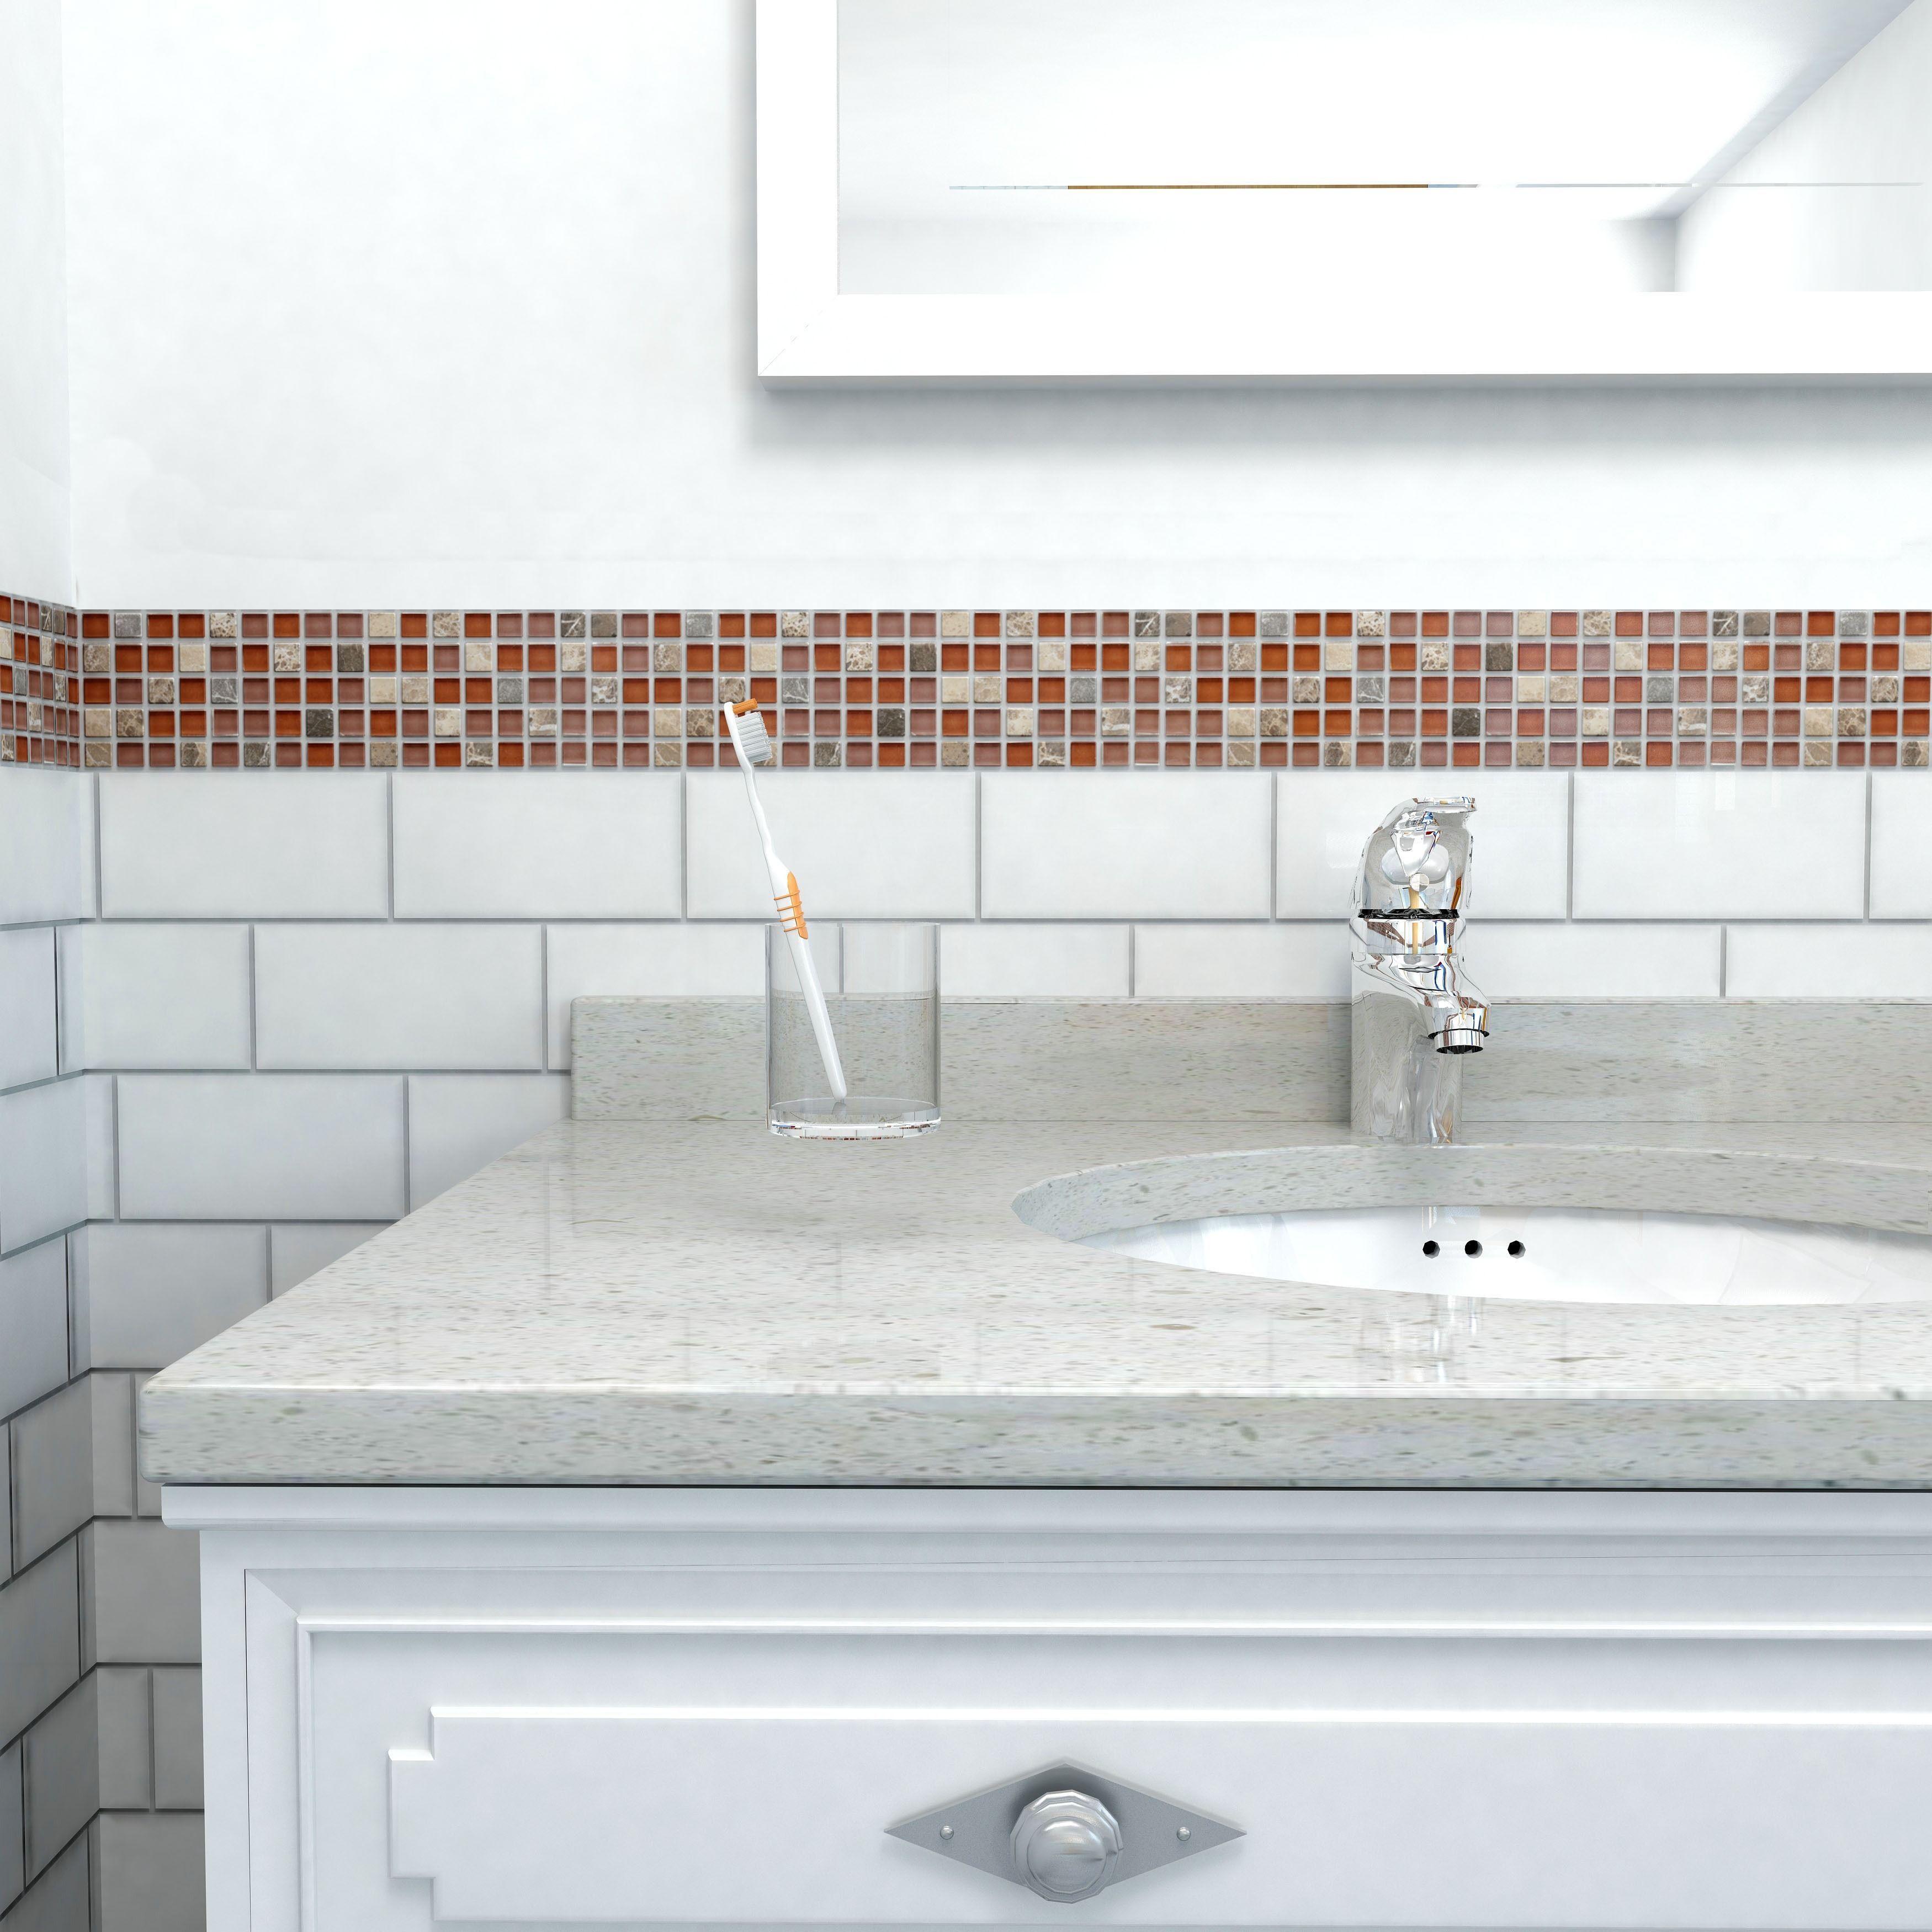 Kitchen backsplash @Overstock - These translucent glass tile sheets ...